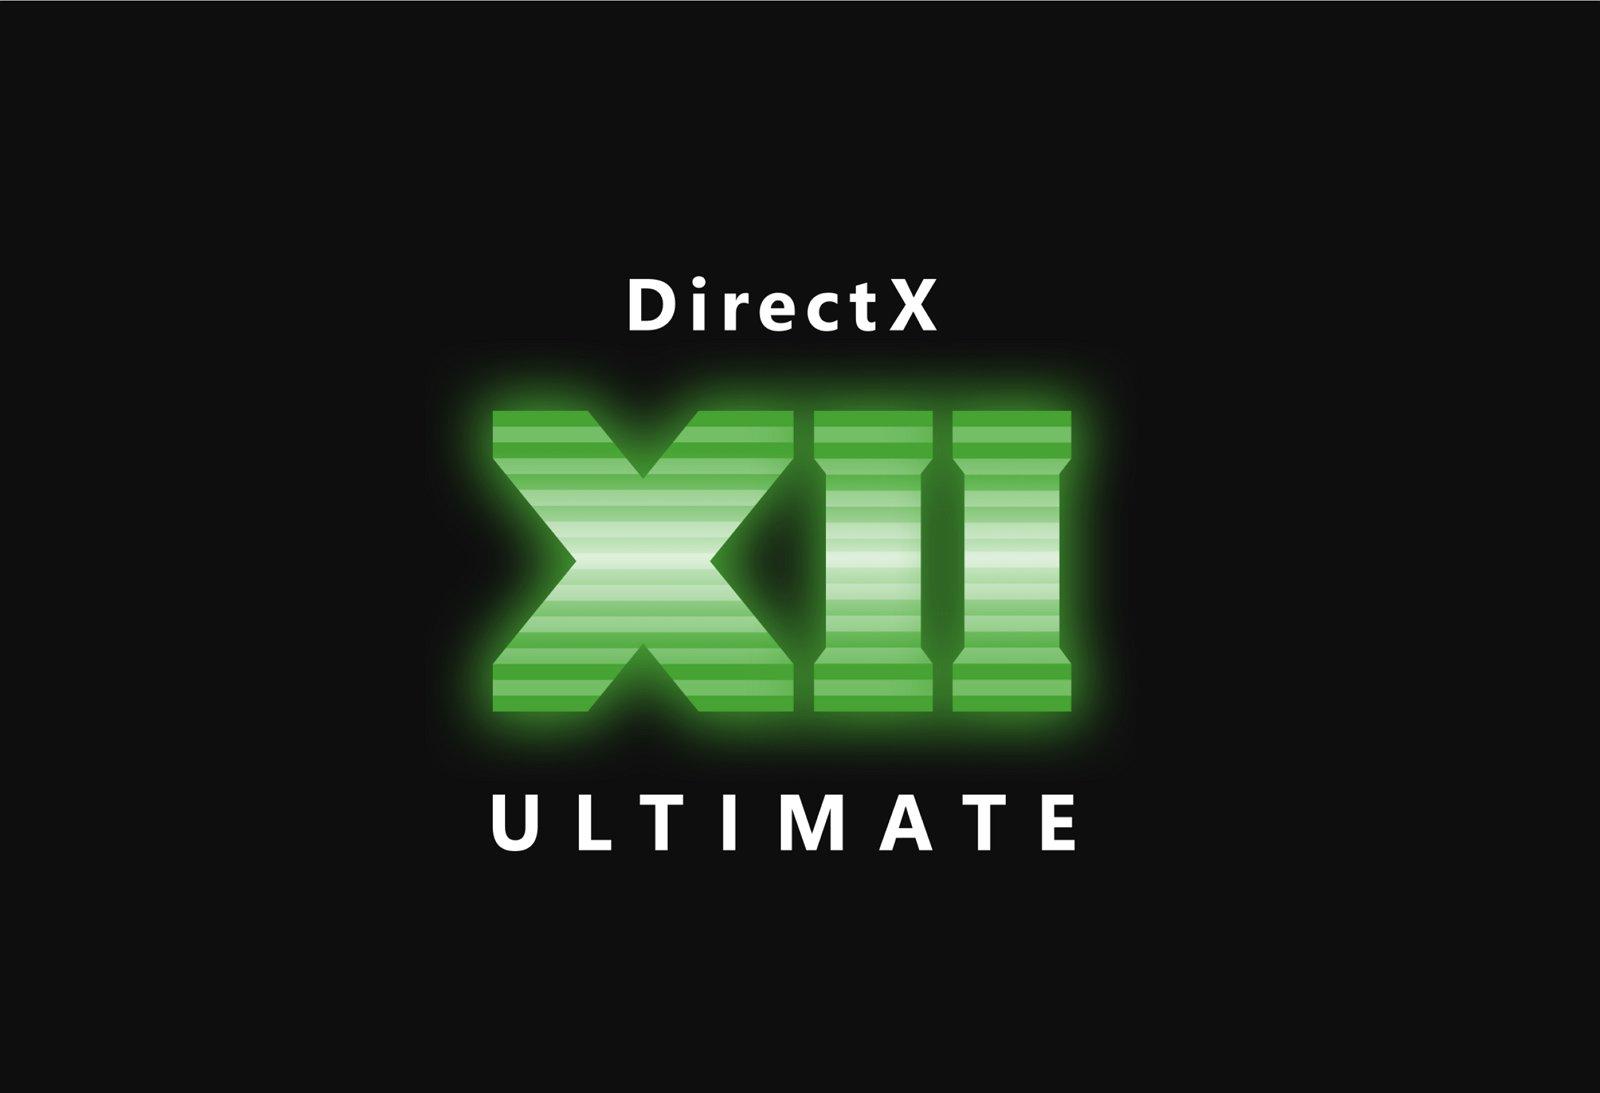 DirectX 12 Ultimate logo (source: Microsoft)